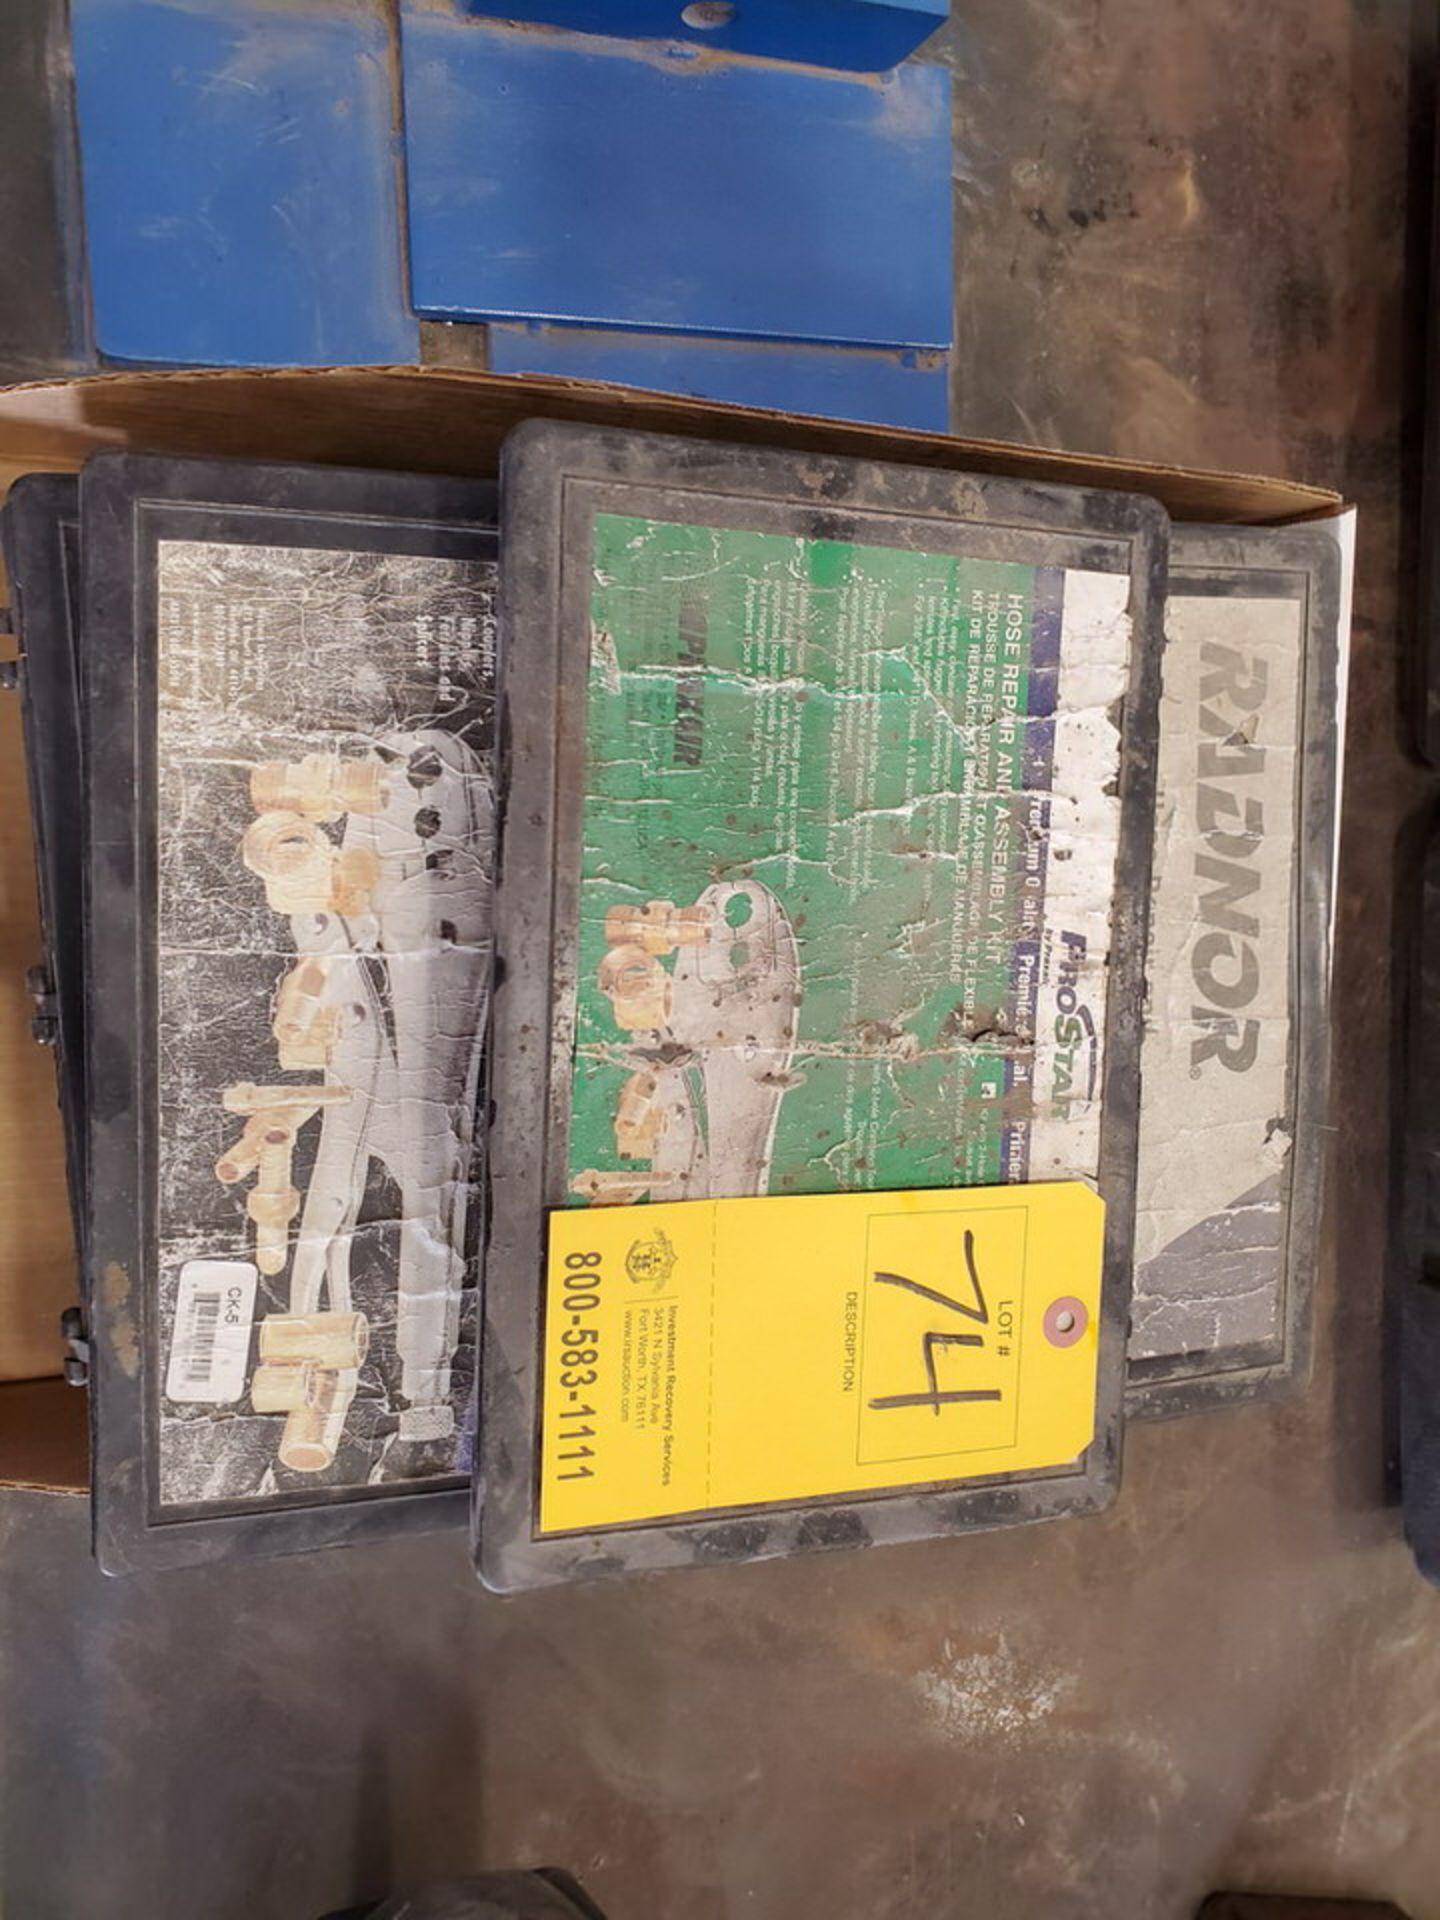 Radnor & Frostar (7) Hose Repair & Assy Kits